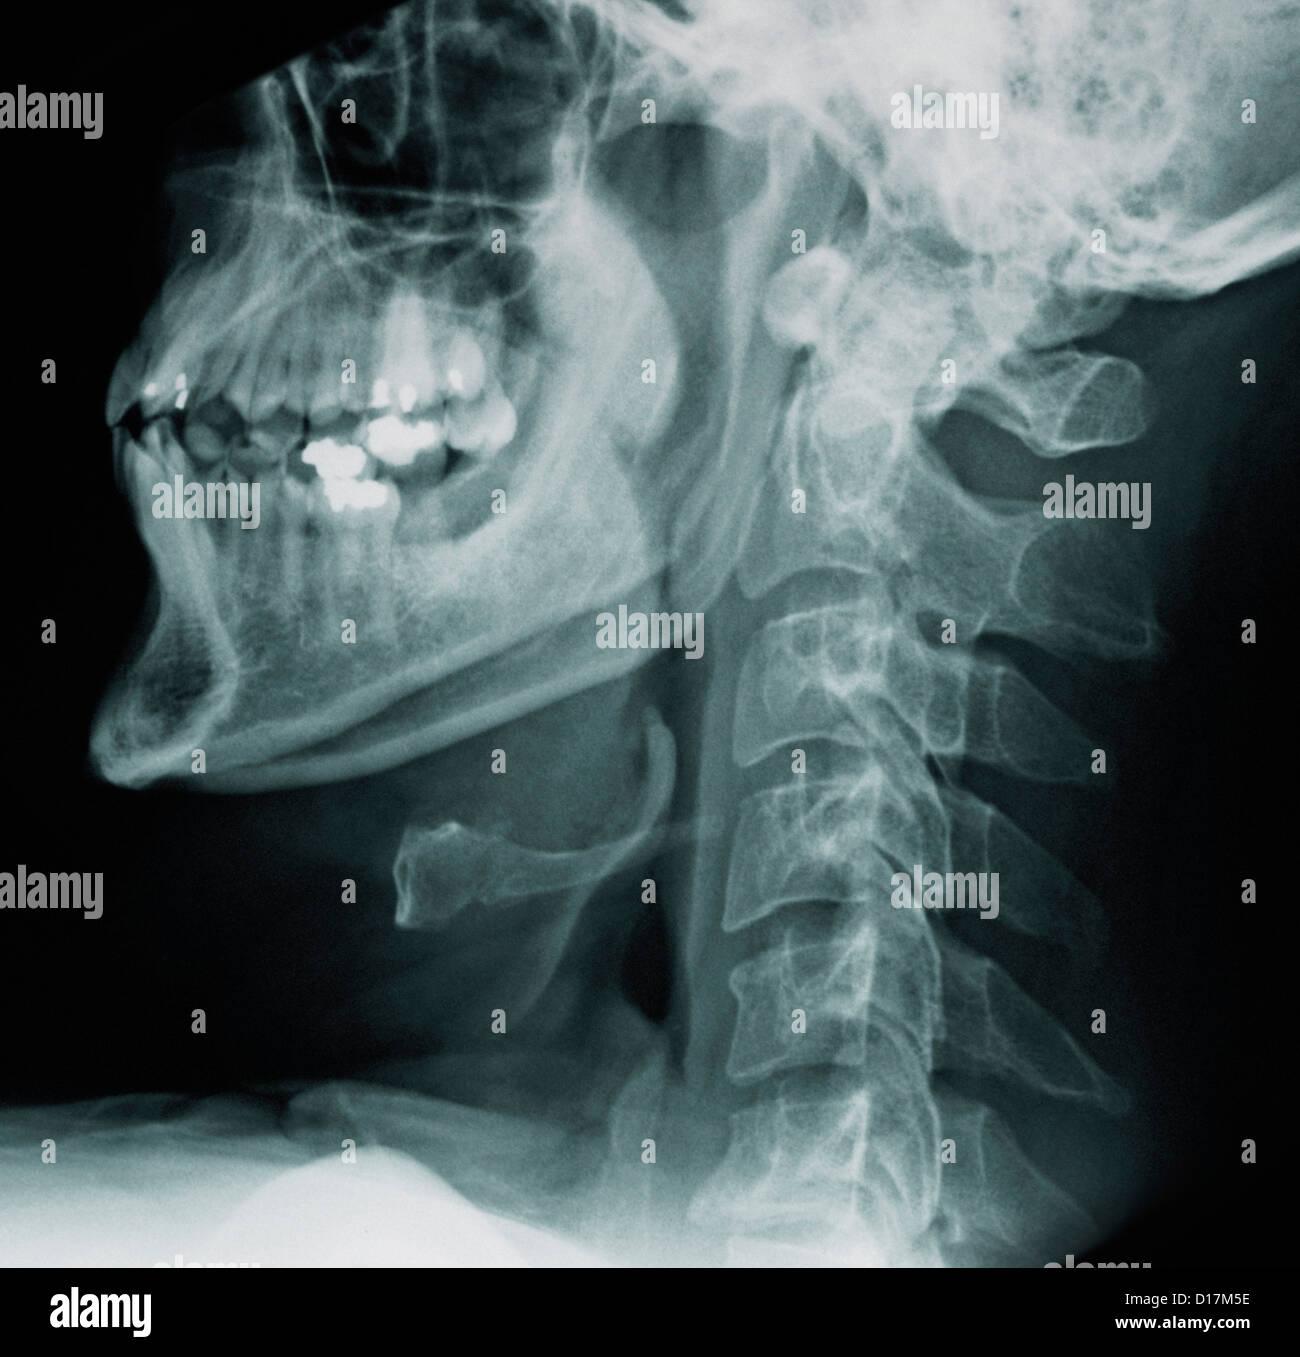 Neck X Ray Of Cervical Vertebrae Stockfotos & Neck X Ray Of Cervical ...